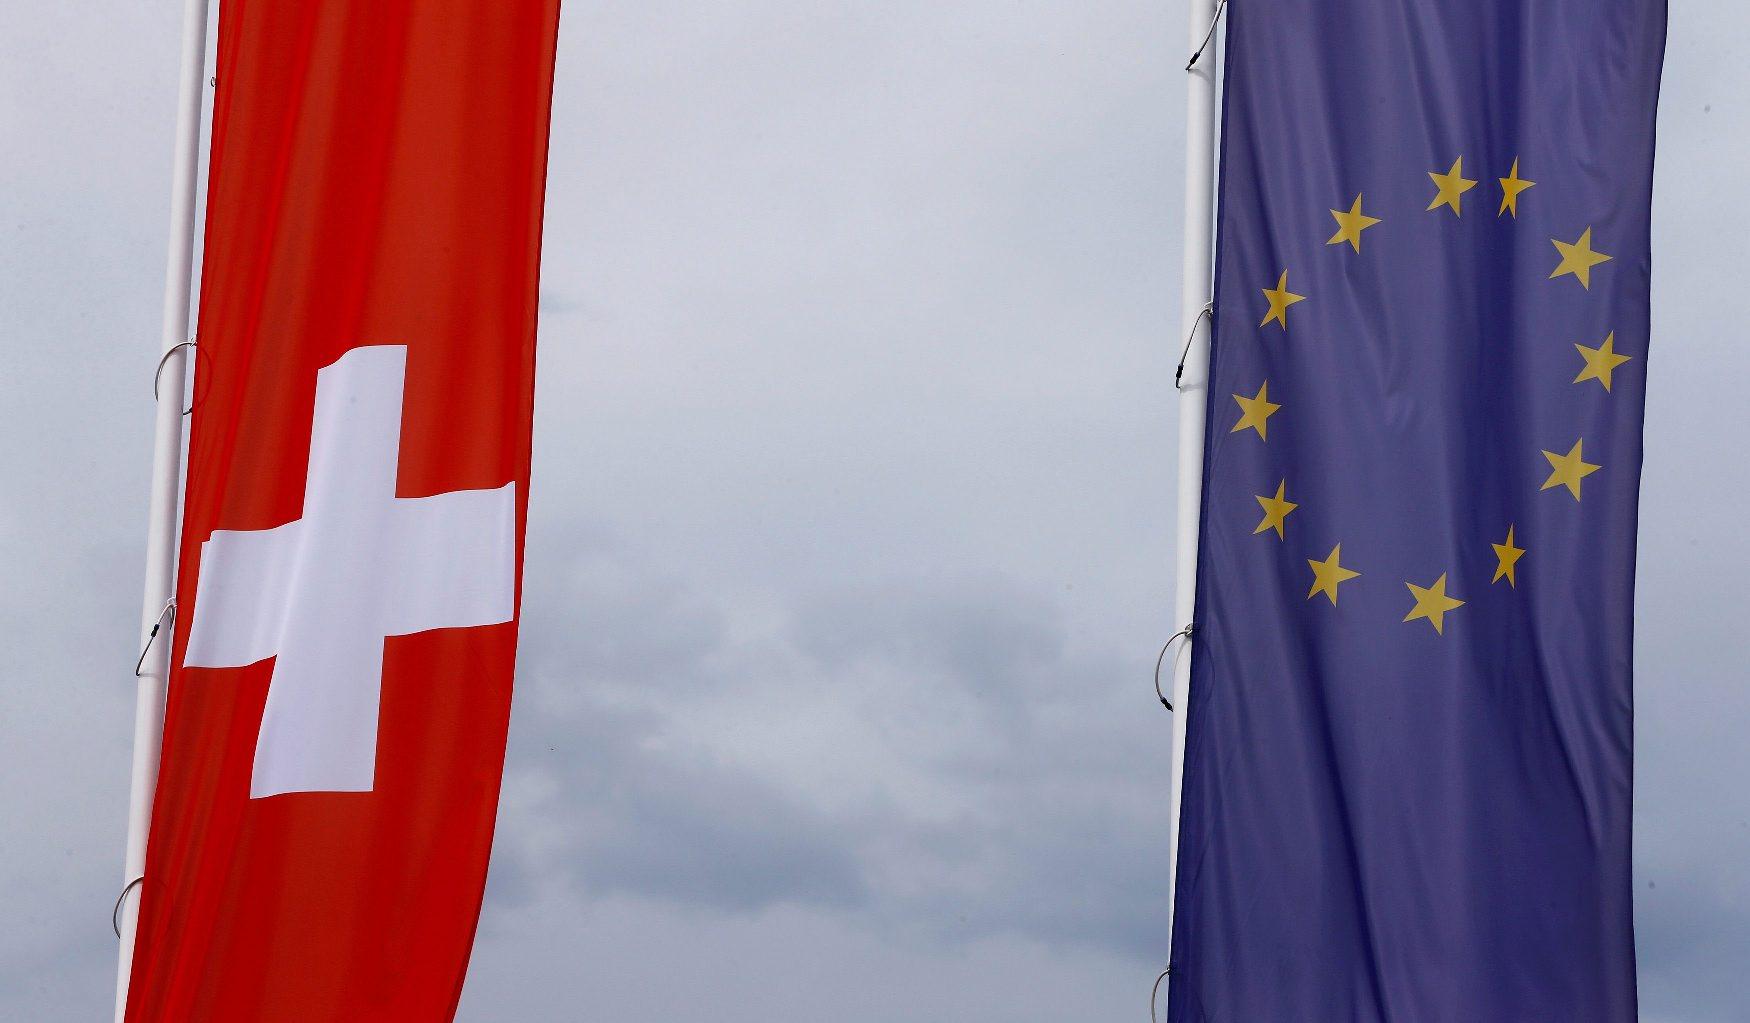 Ilustracija; zastave Švicarske i Europske unije